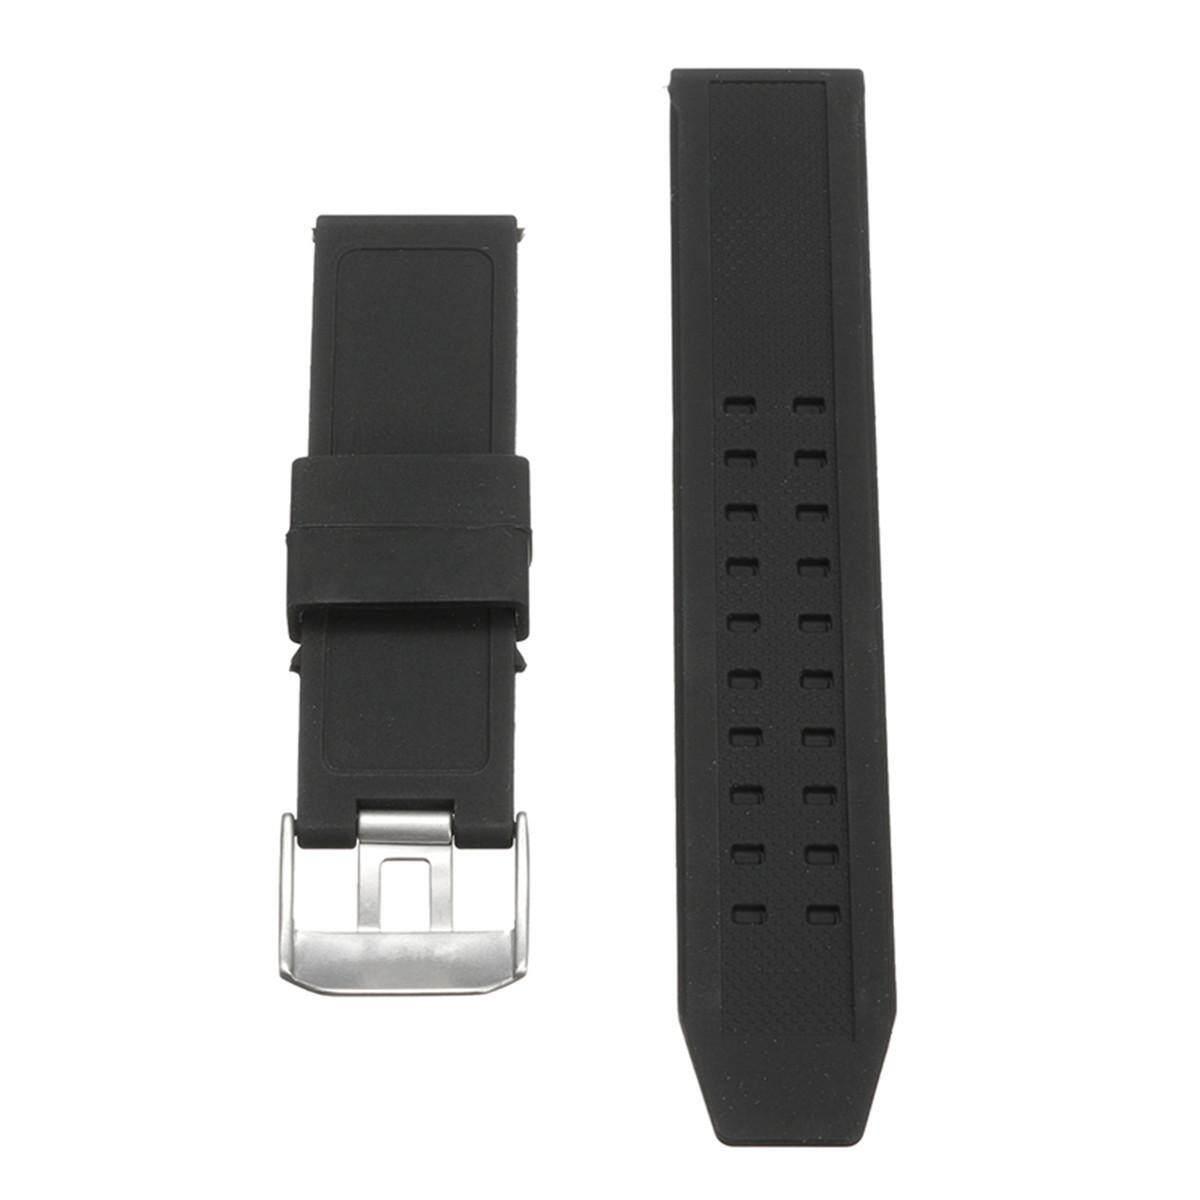 23 Karet Silikon Tali Jam Tangan Hitam Tali Gelang untuk Luminox Penggantian-Intl